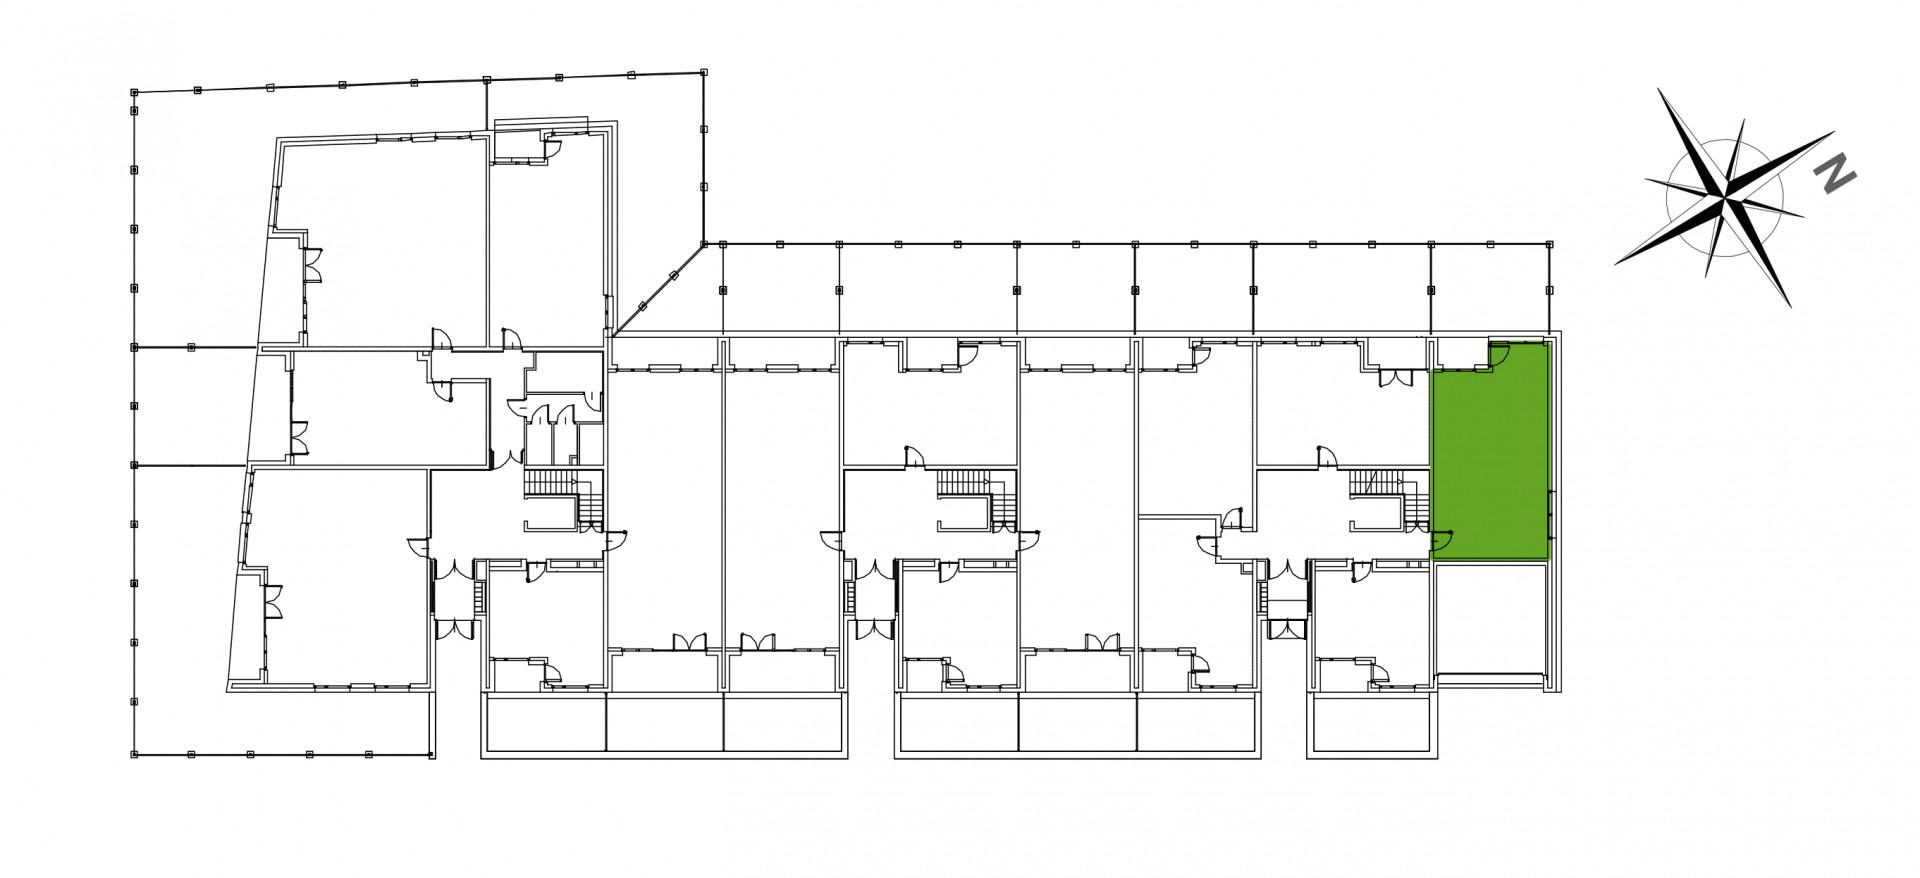 Mazowiecka 72 / apartament nr 4 rzut 2